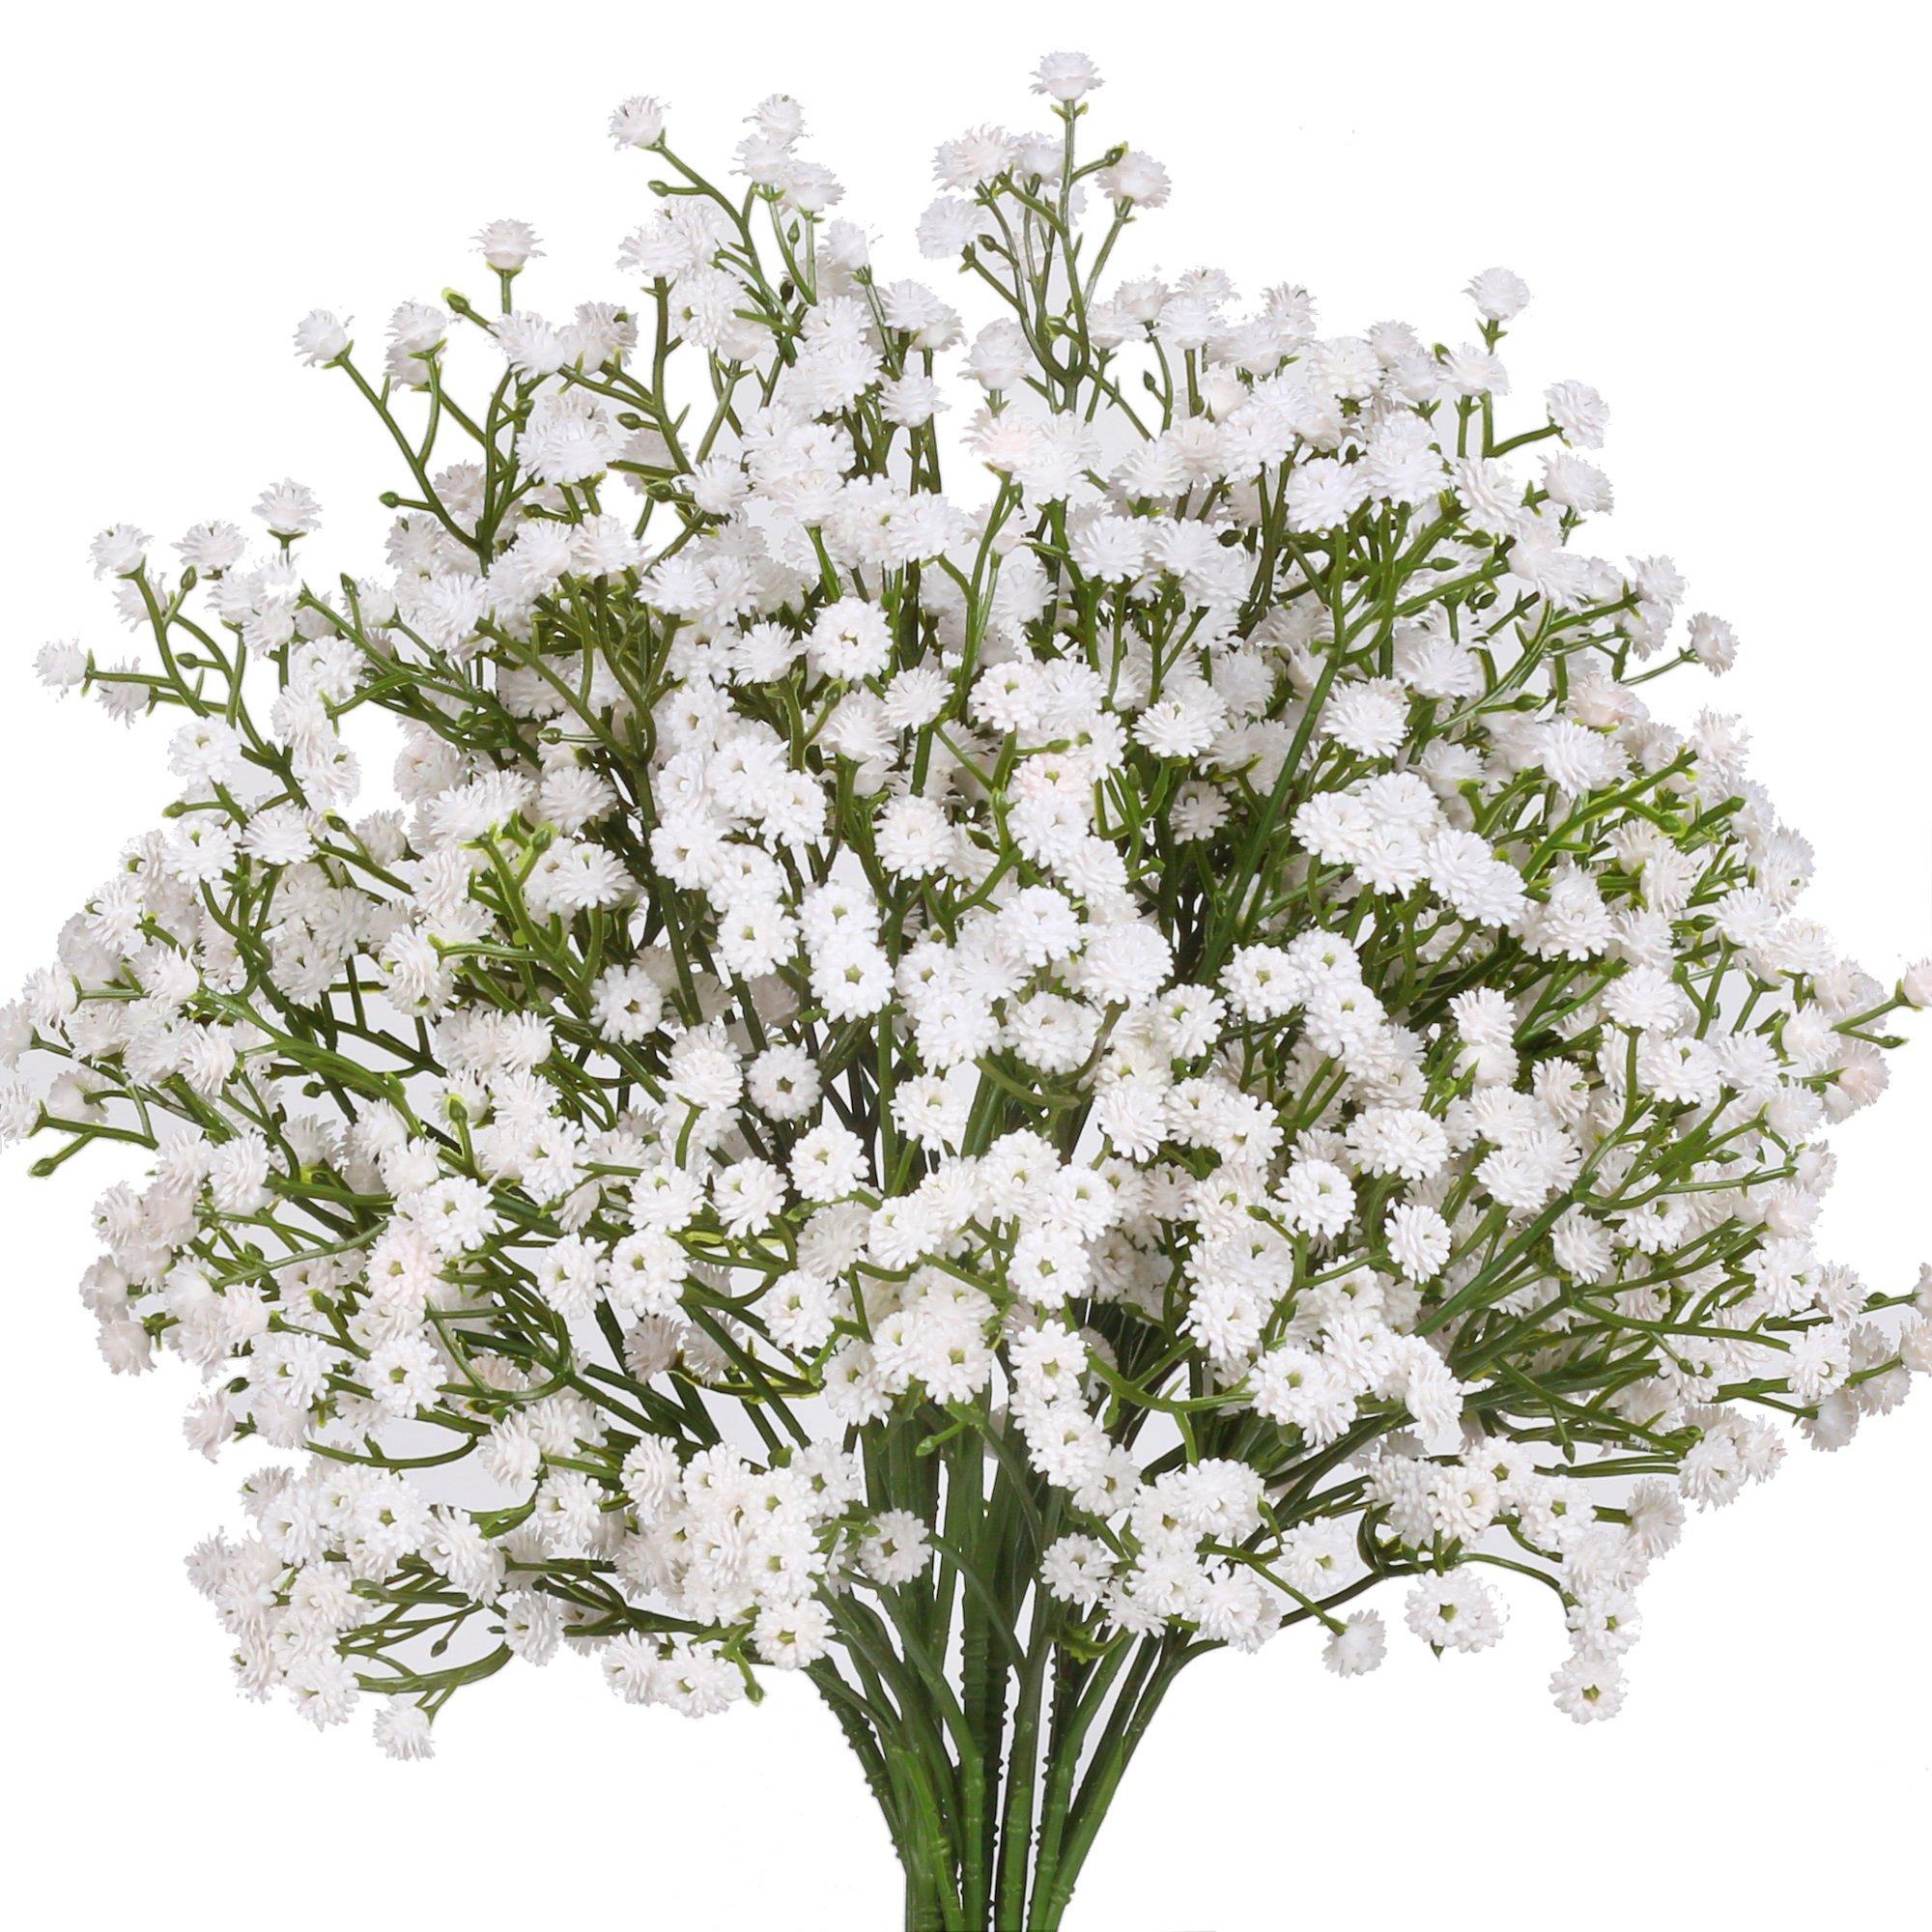 Artificial Fake Flowers Babys Breathgypsophila Bouquets For Wedding